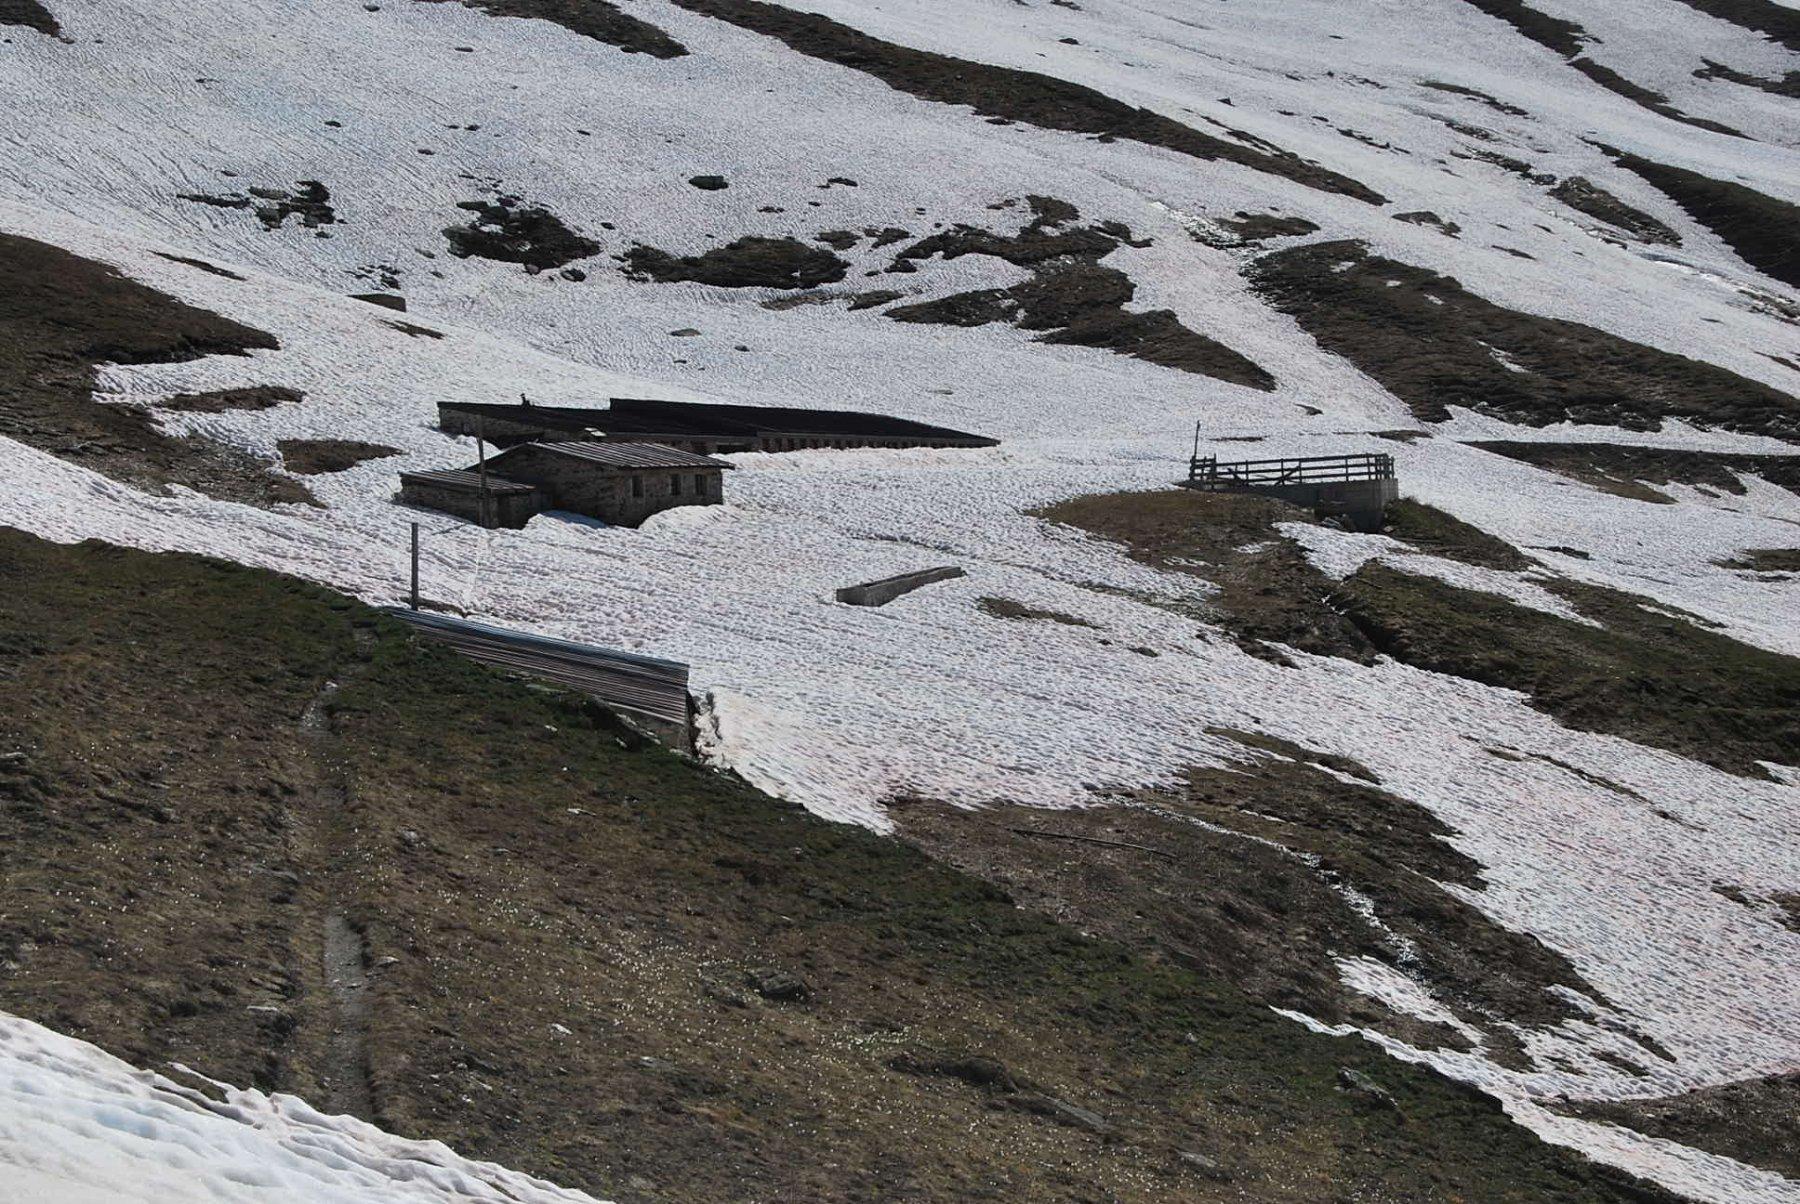 L'arrivo al Tramail des Ors, dove la neve è ormai continua.